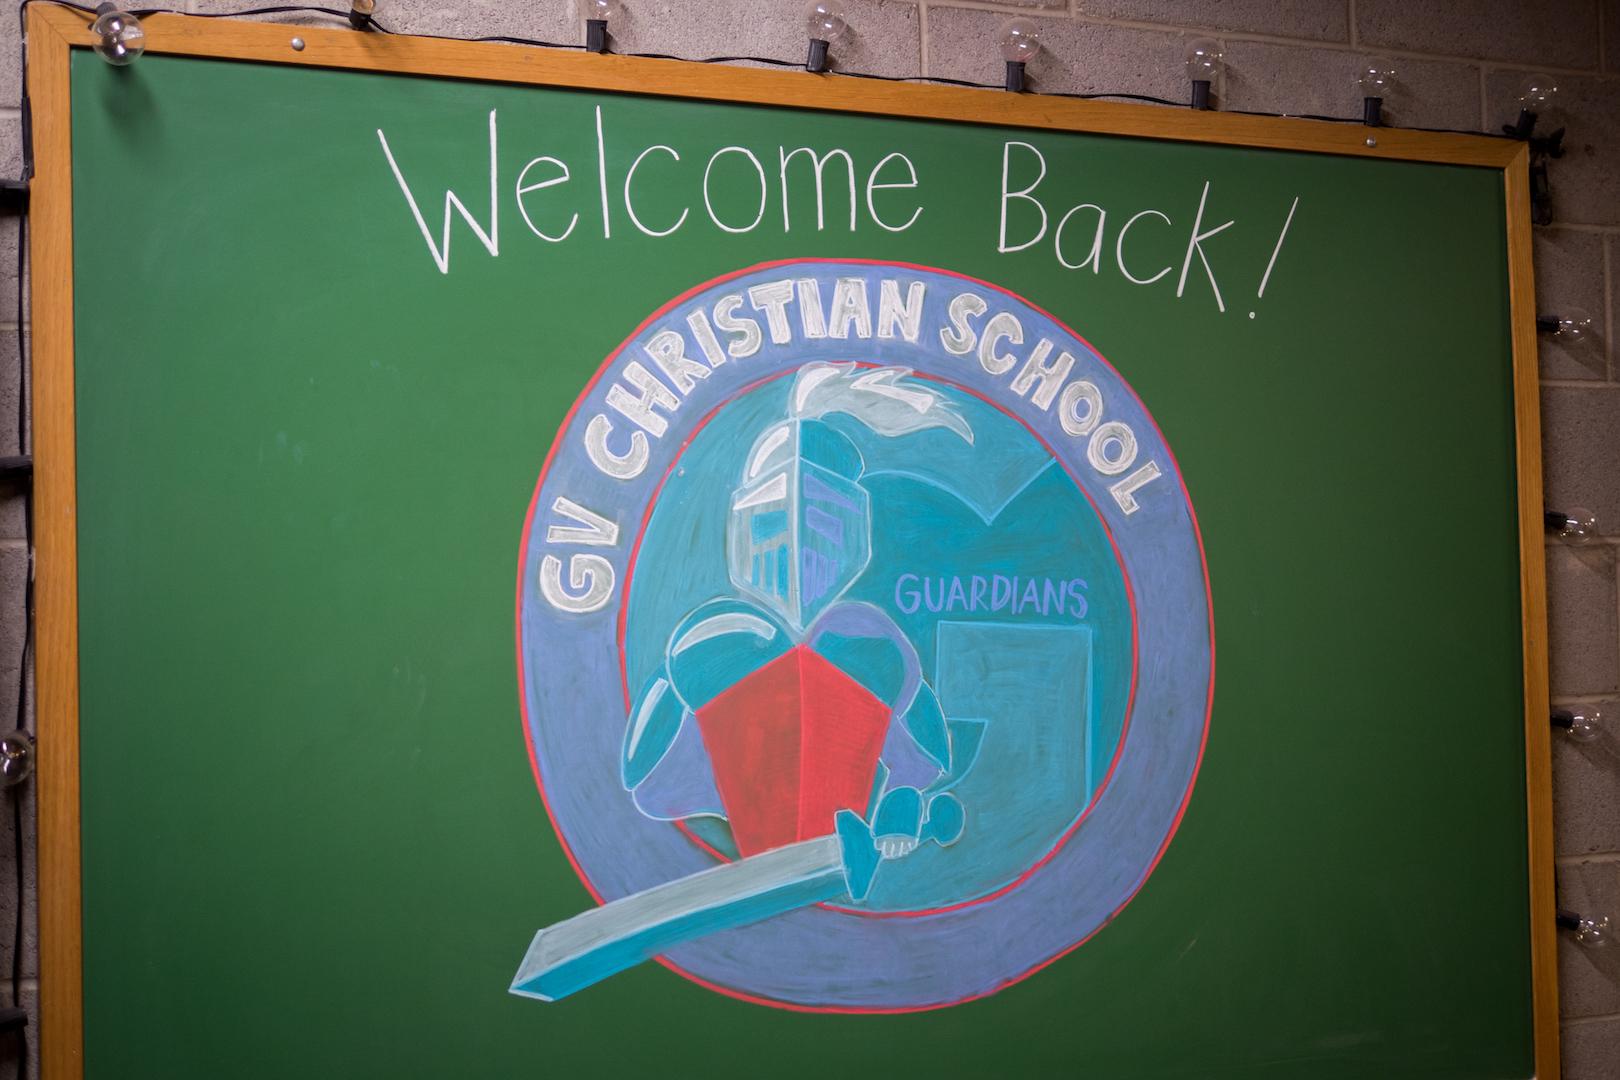 GV Christian School